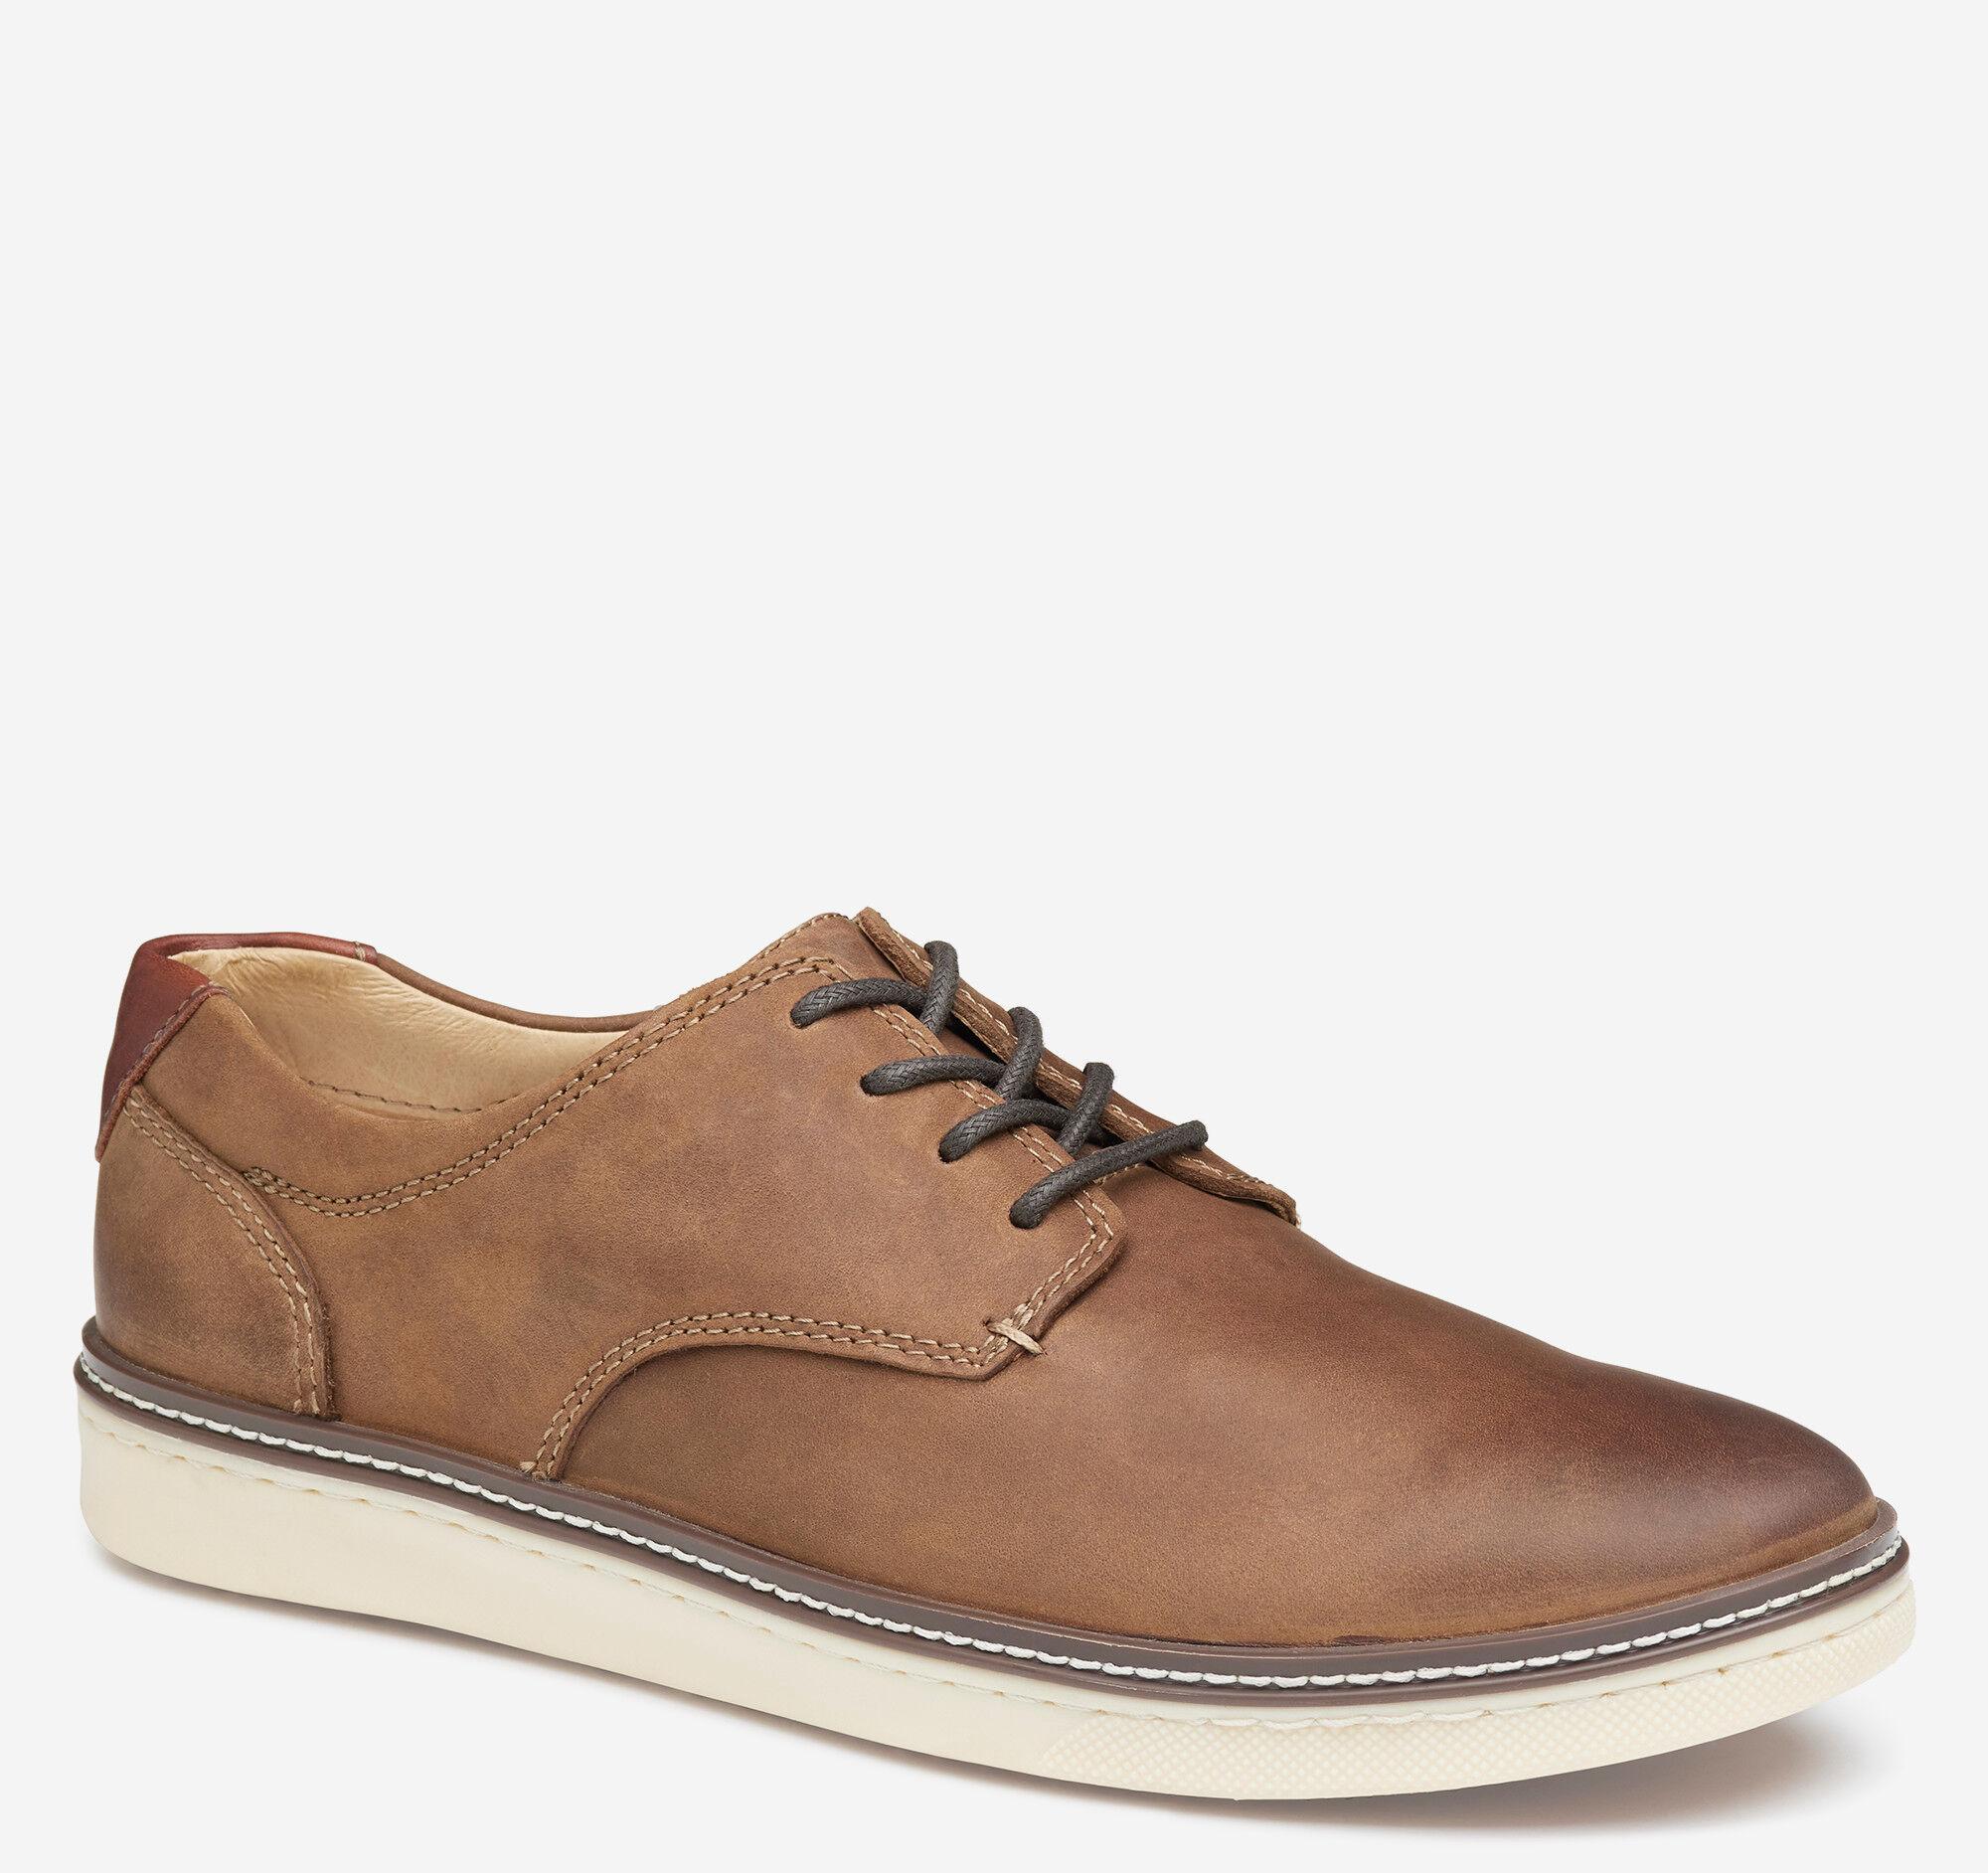 Johnston & Murphy Men's McGuffey Plain Toe Shoe - Tan Oiled Full Grain - Size 8.5 - M